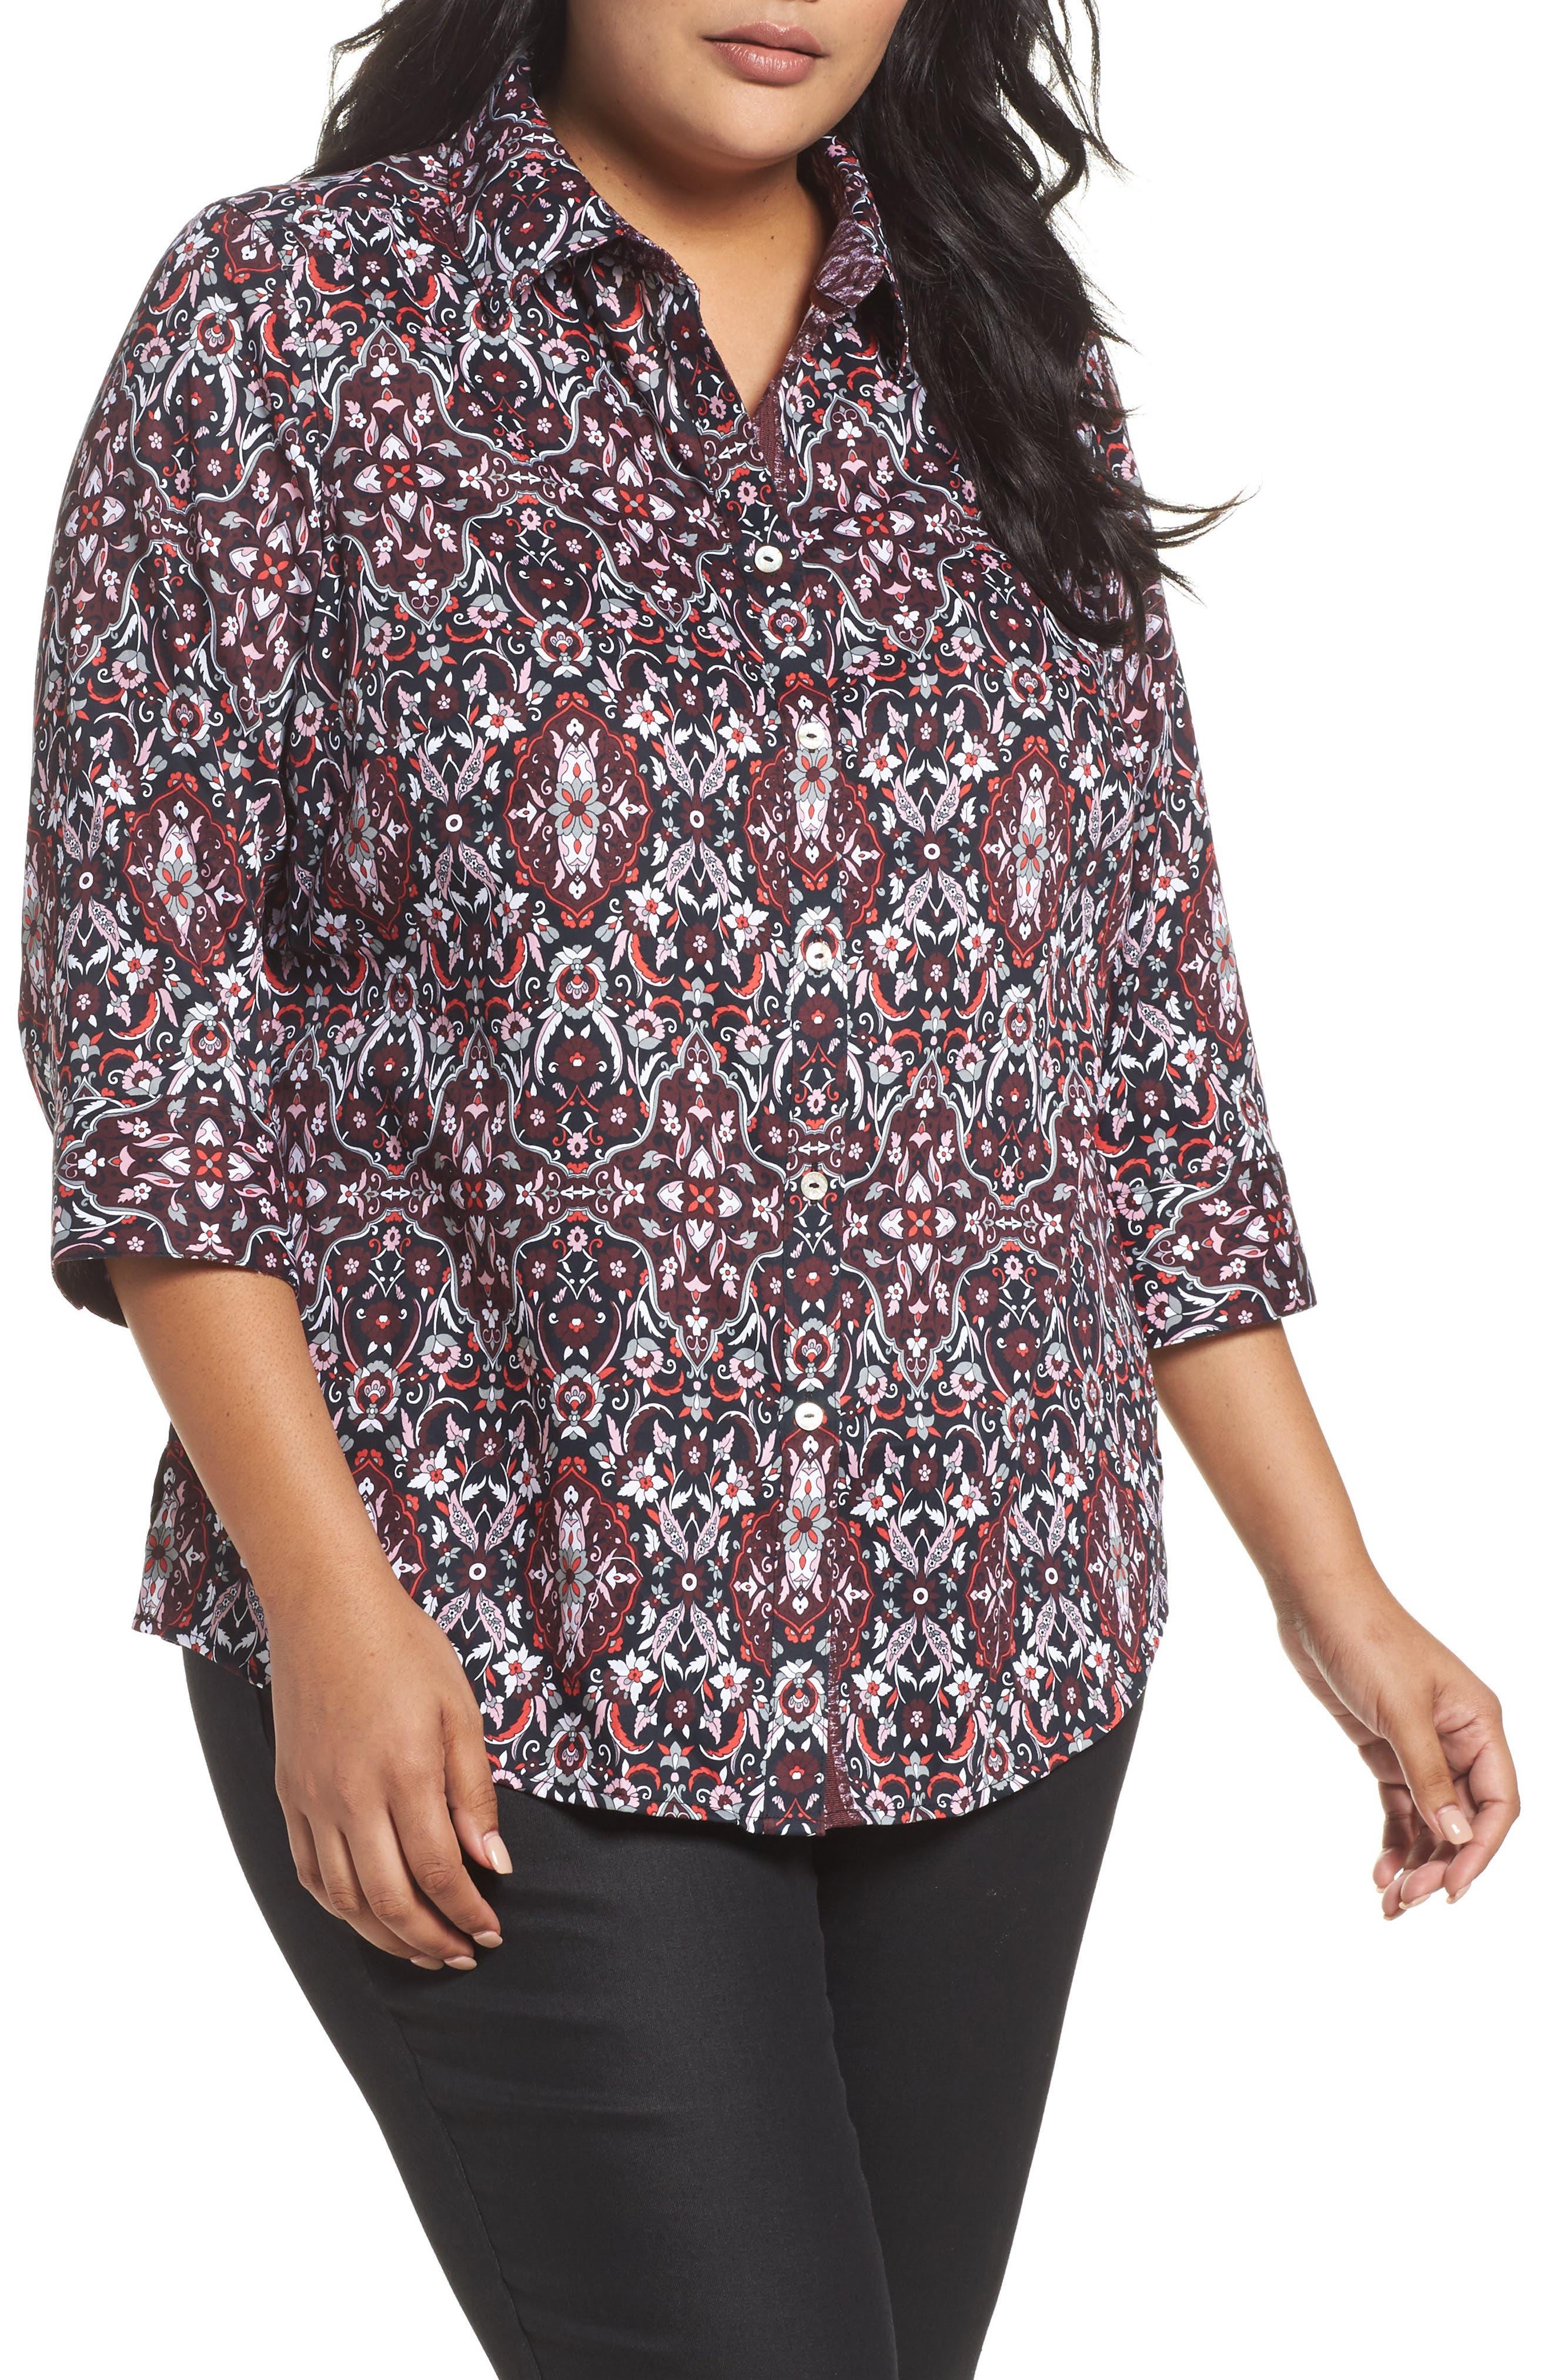 Ava Heirloom Paisley Print Cotton Shirt,                             Main thumbnail 1, color,                             602